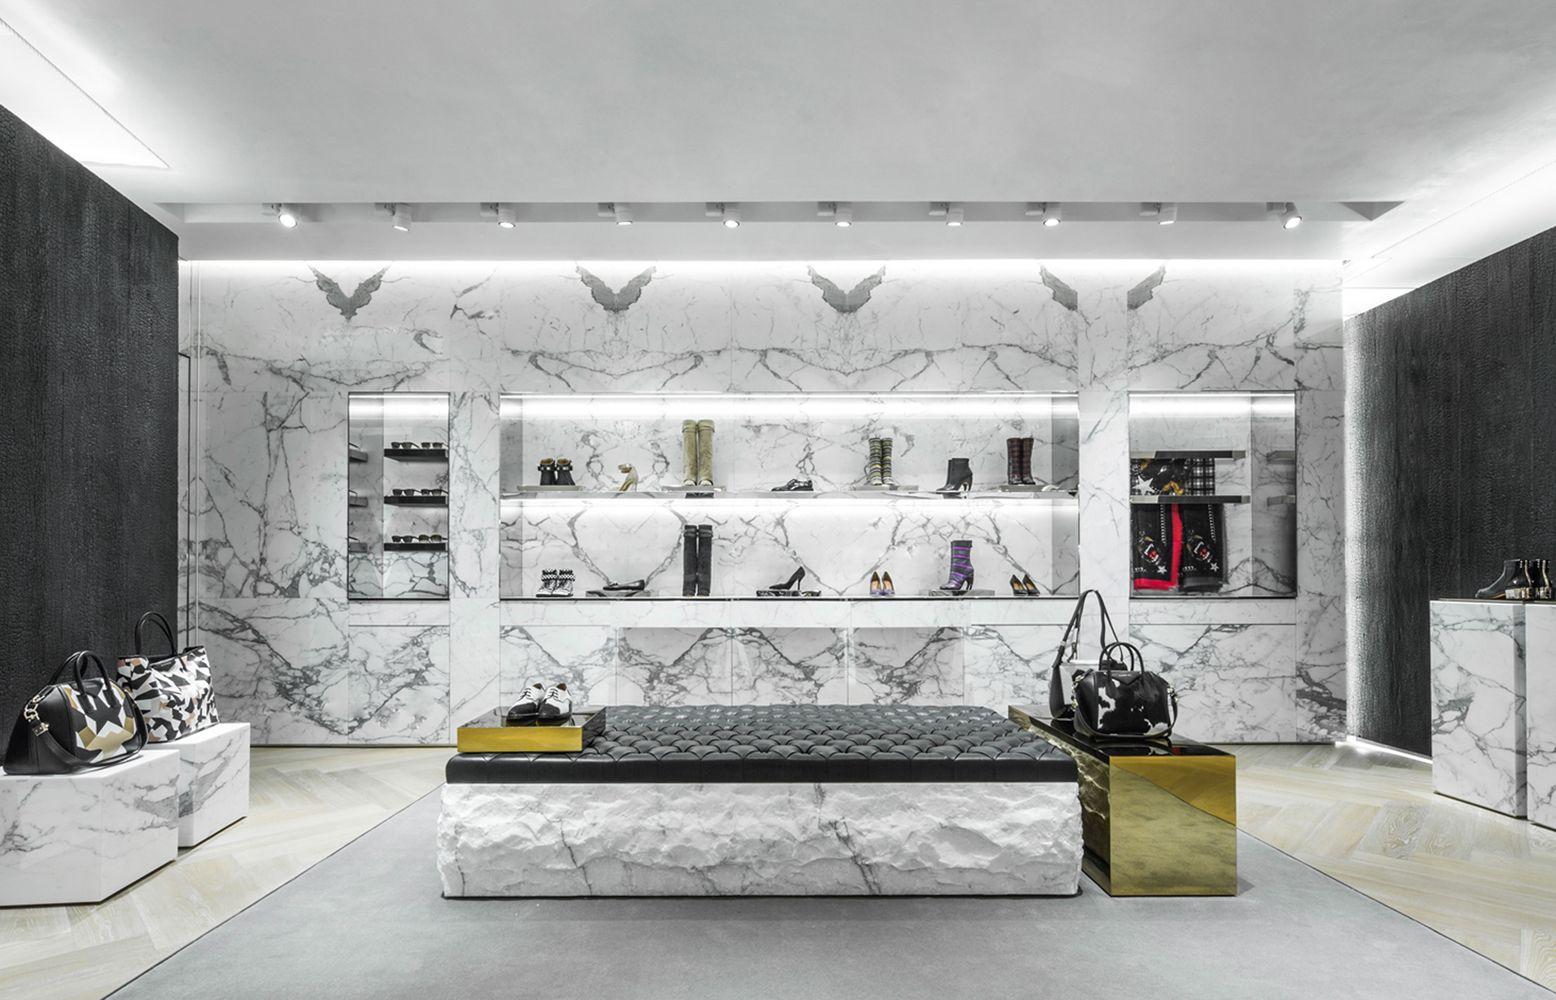 GIVENCHY STORE ELEMENTS HONG KONG   Retail design   Pinterest   Givenchy